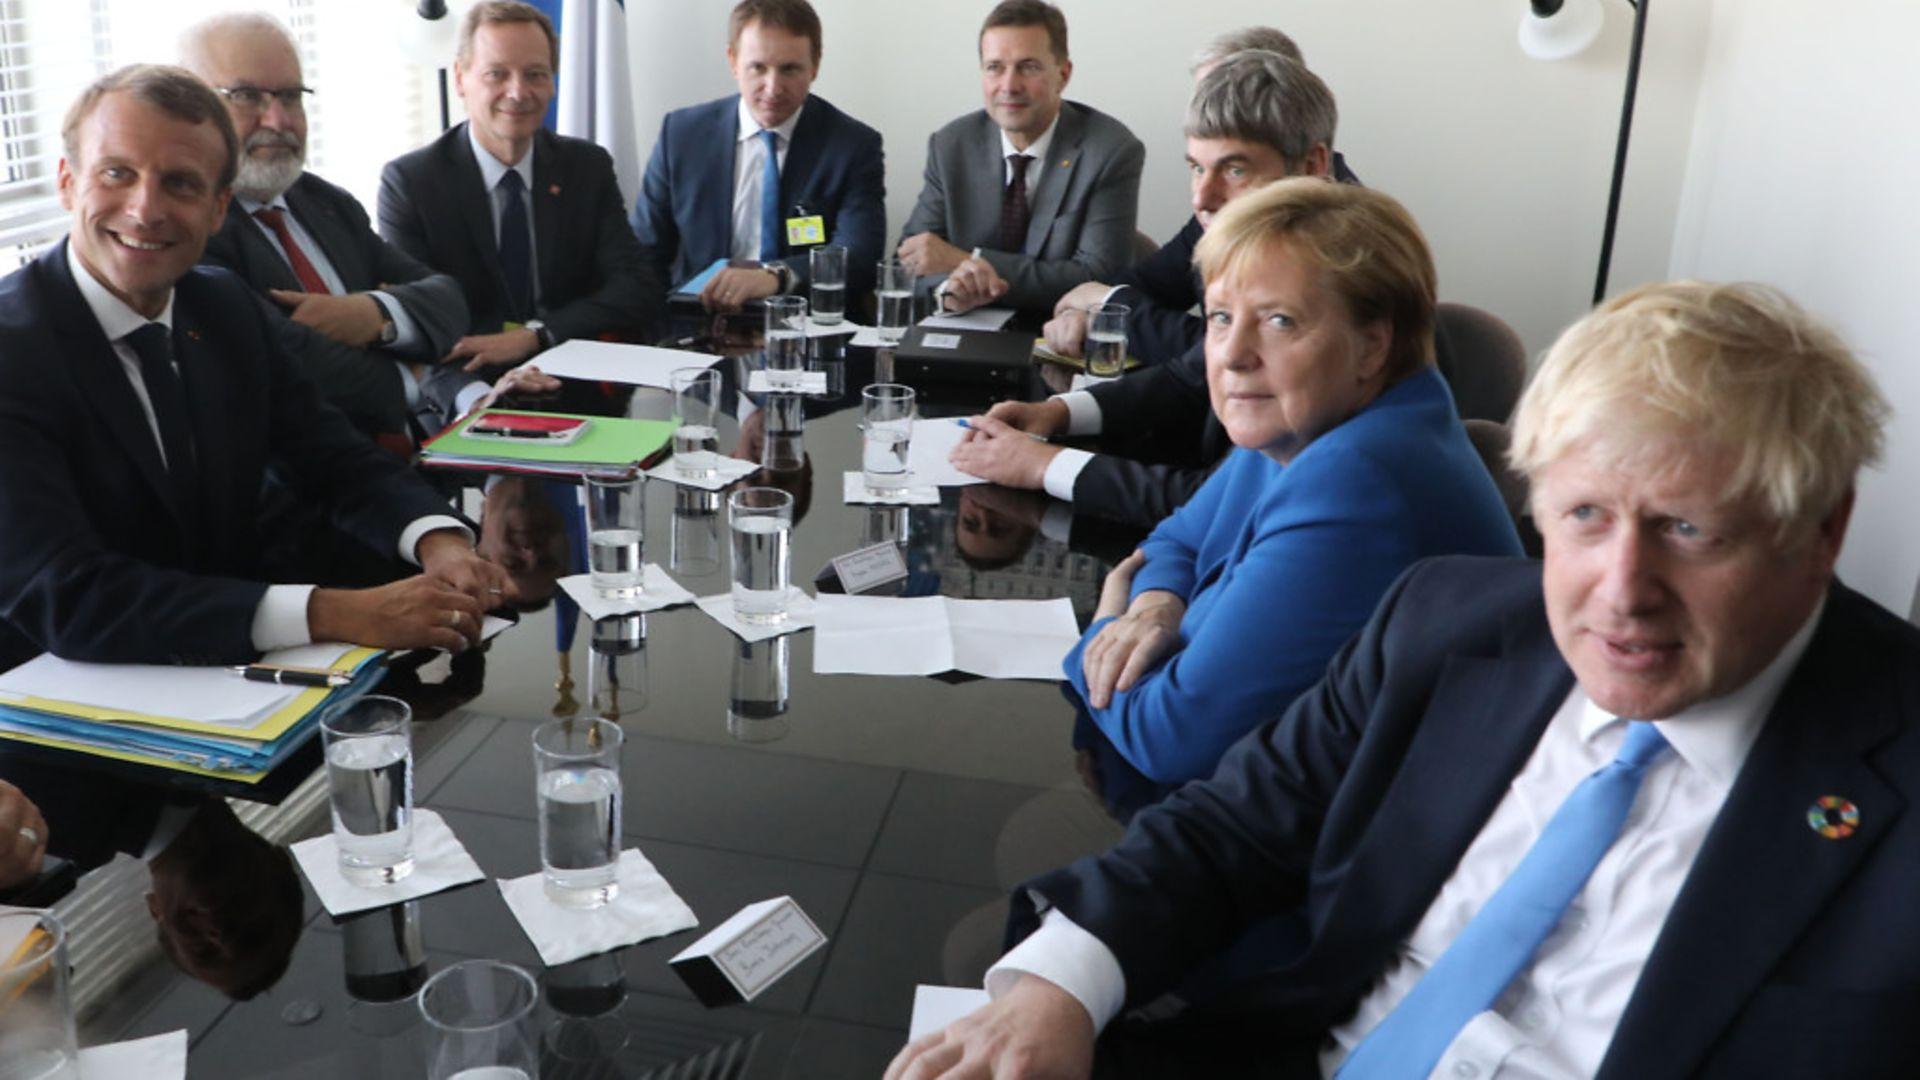 Boris Johnson with world leaders including Angela Merkel and Emmanuel Macron - Credit: AFP via Getty Images